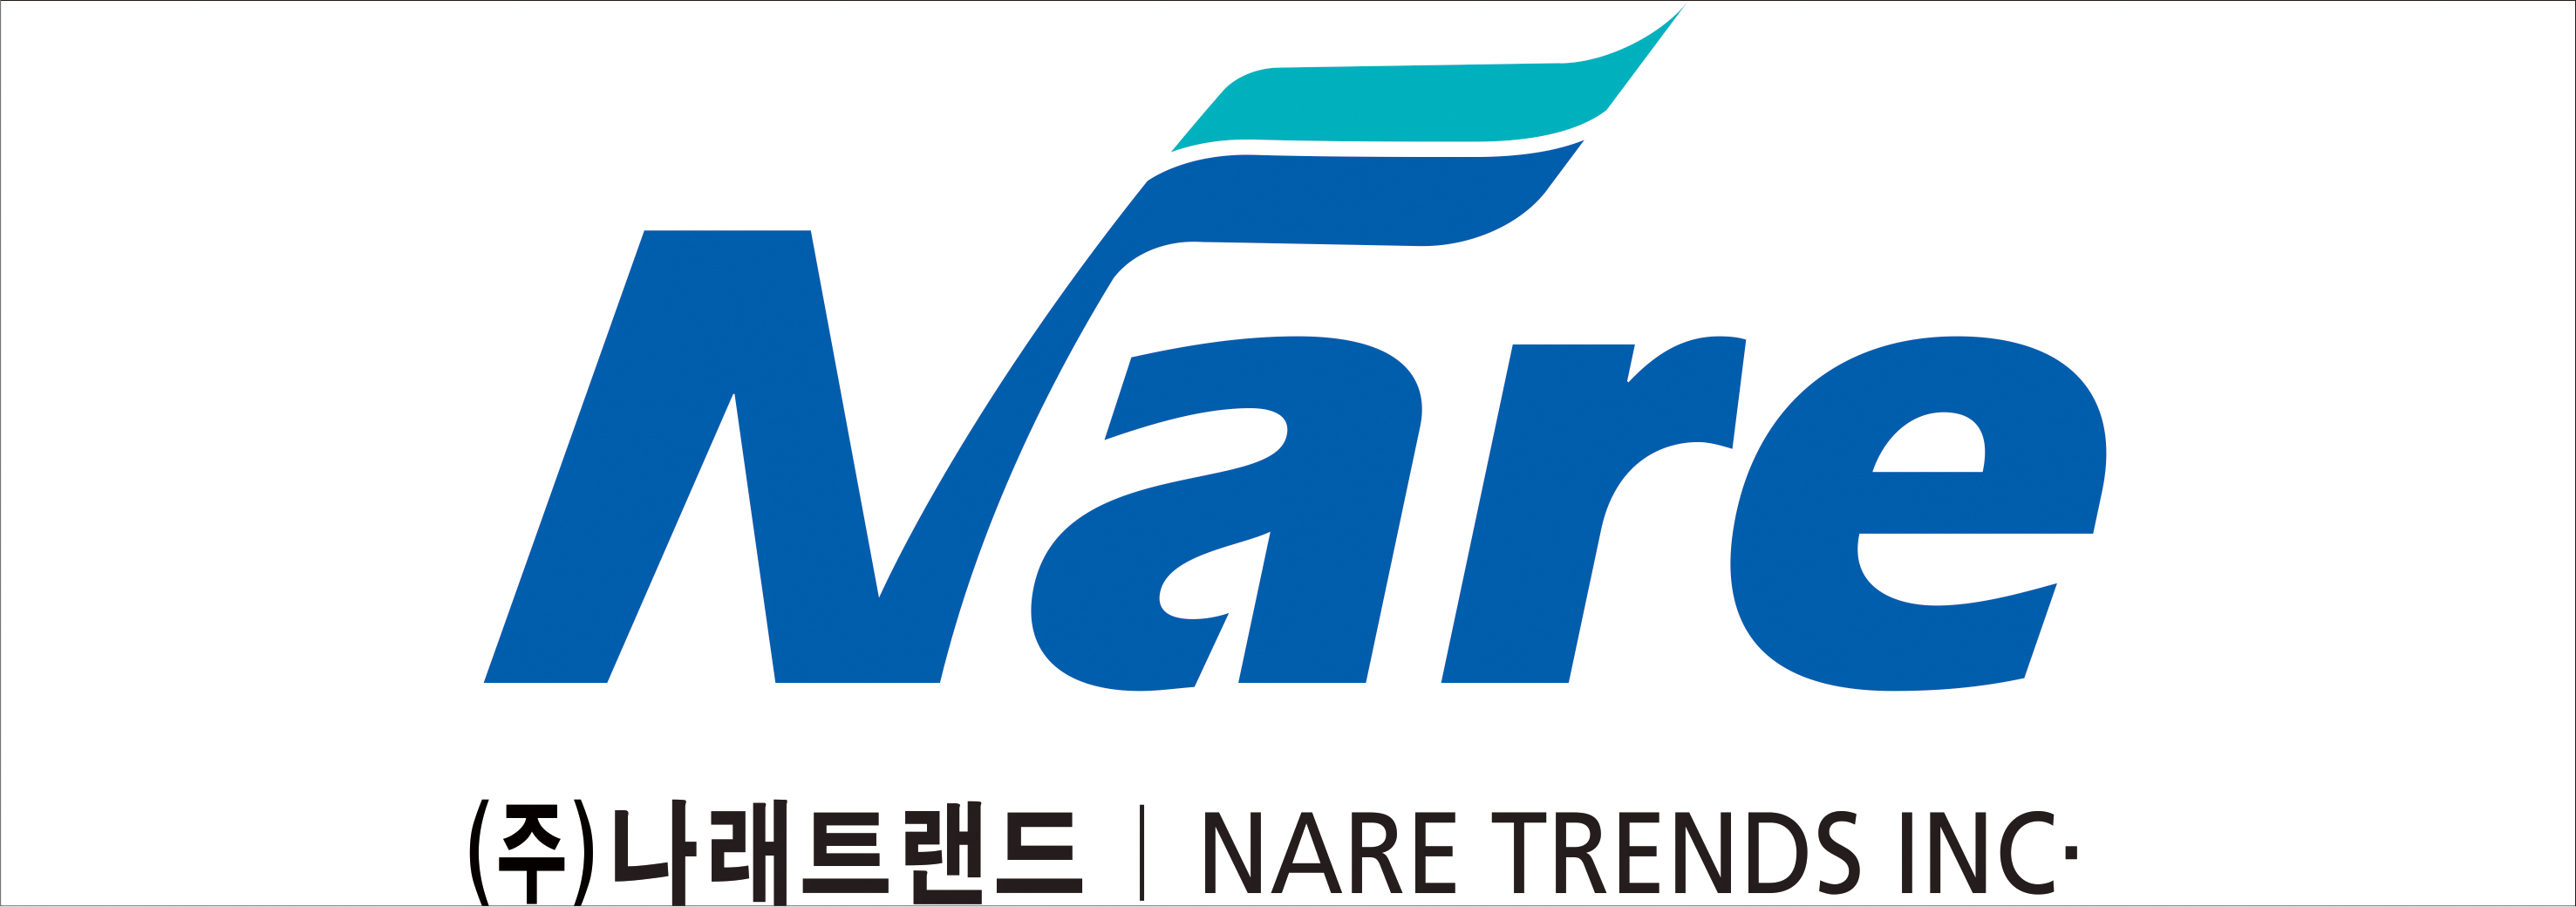 Naretrends-深圳物联网展会